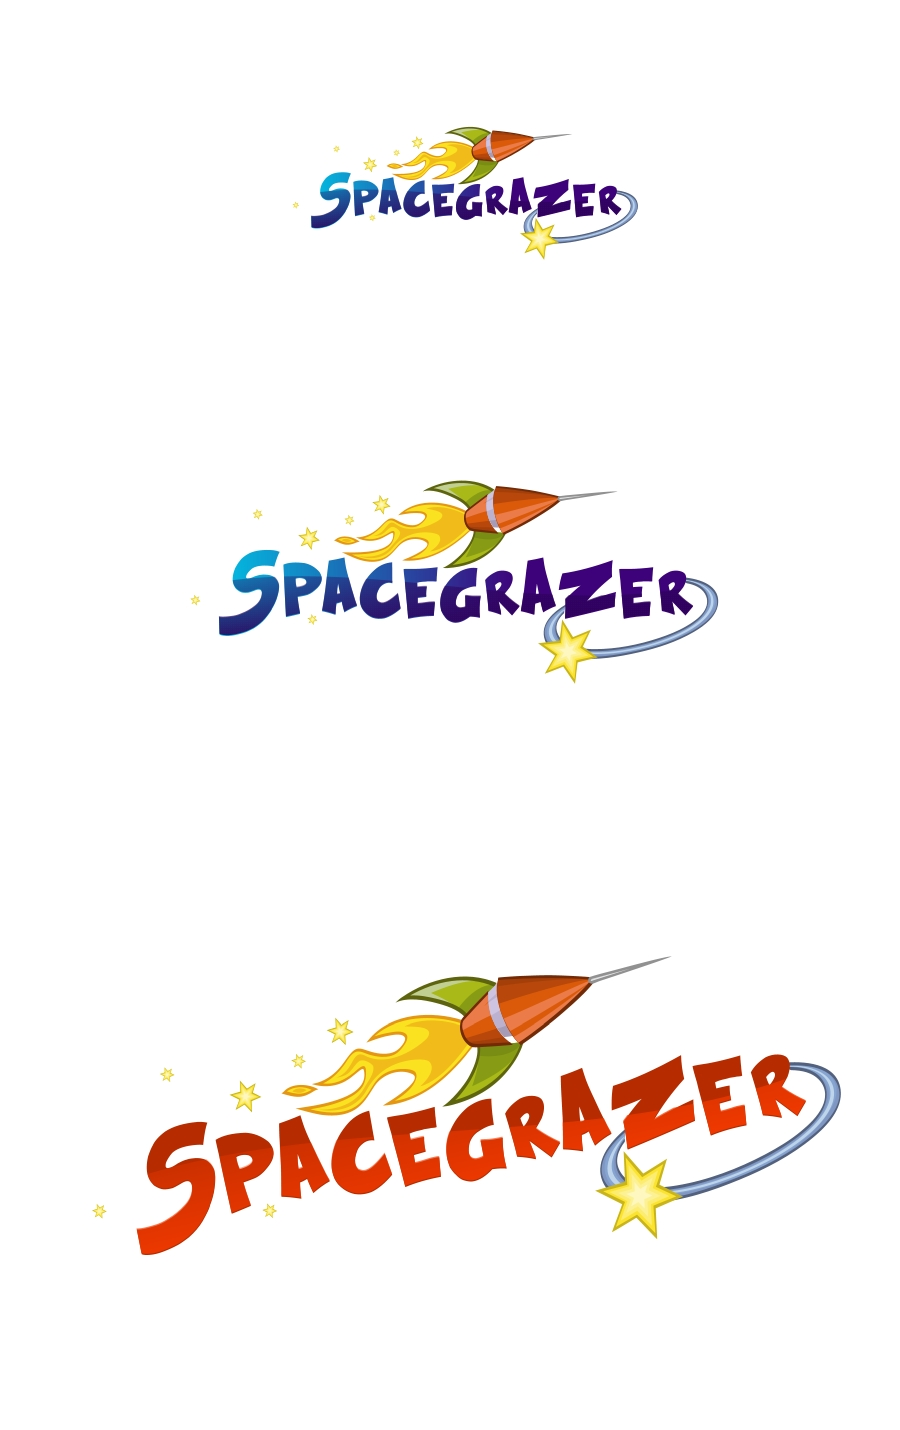 Logo Design by Private User - Entry No. 163 in the Logo Design Contest Fun Logo Design for Spacegrazer.